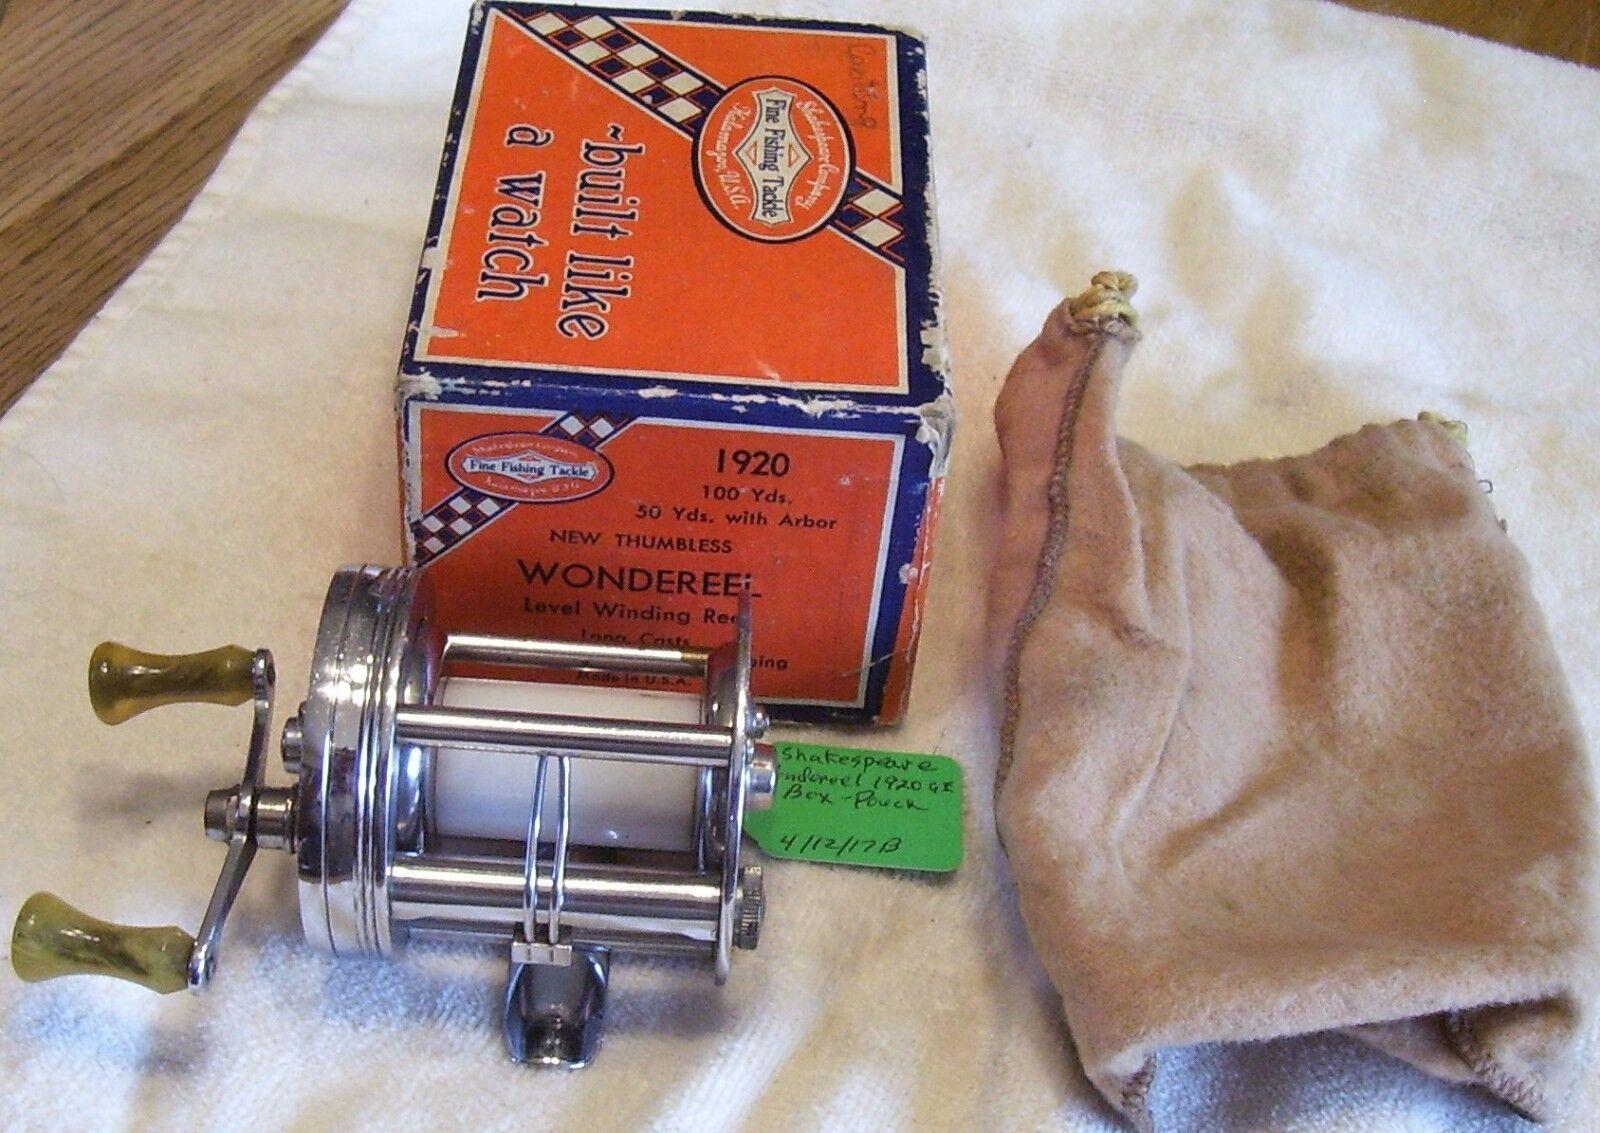 SHAKESPEARE WONDEREEL 1920 GA  REEL  04 12 17 MW  BOX POUCH  VERY NICE